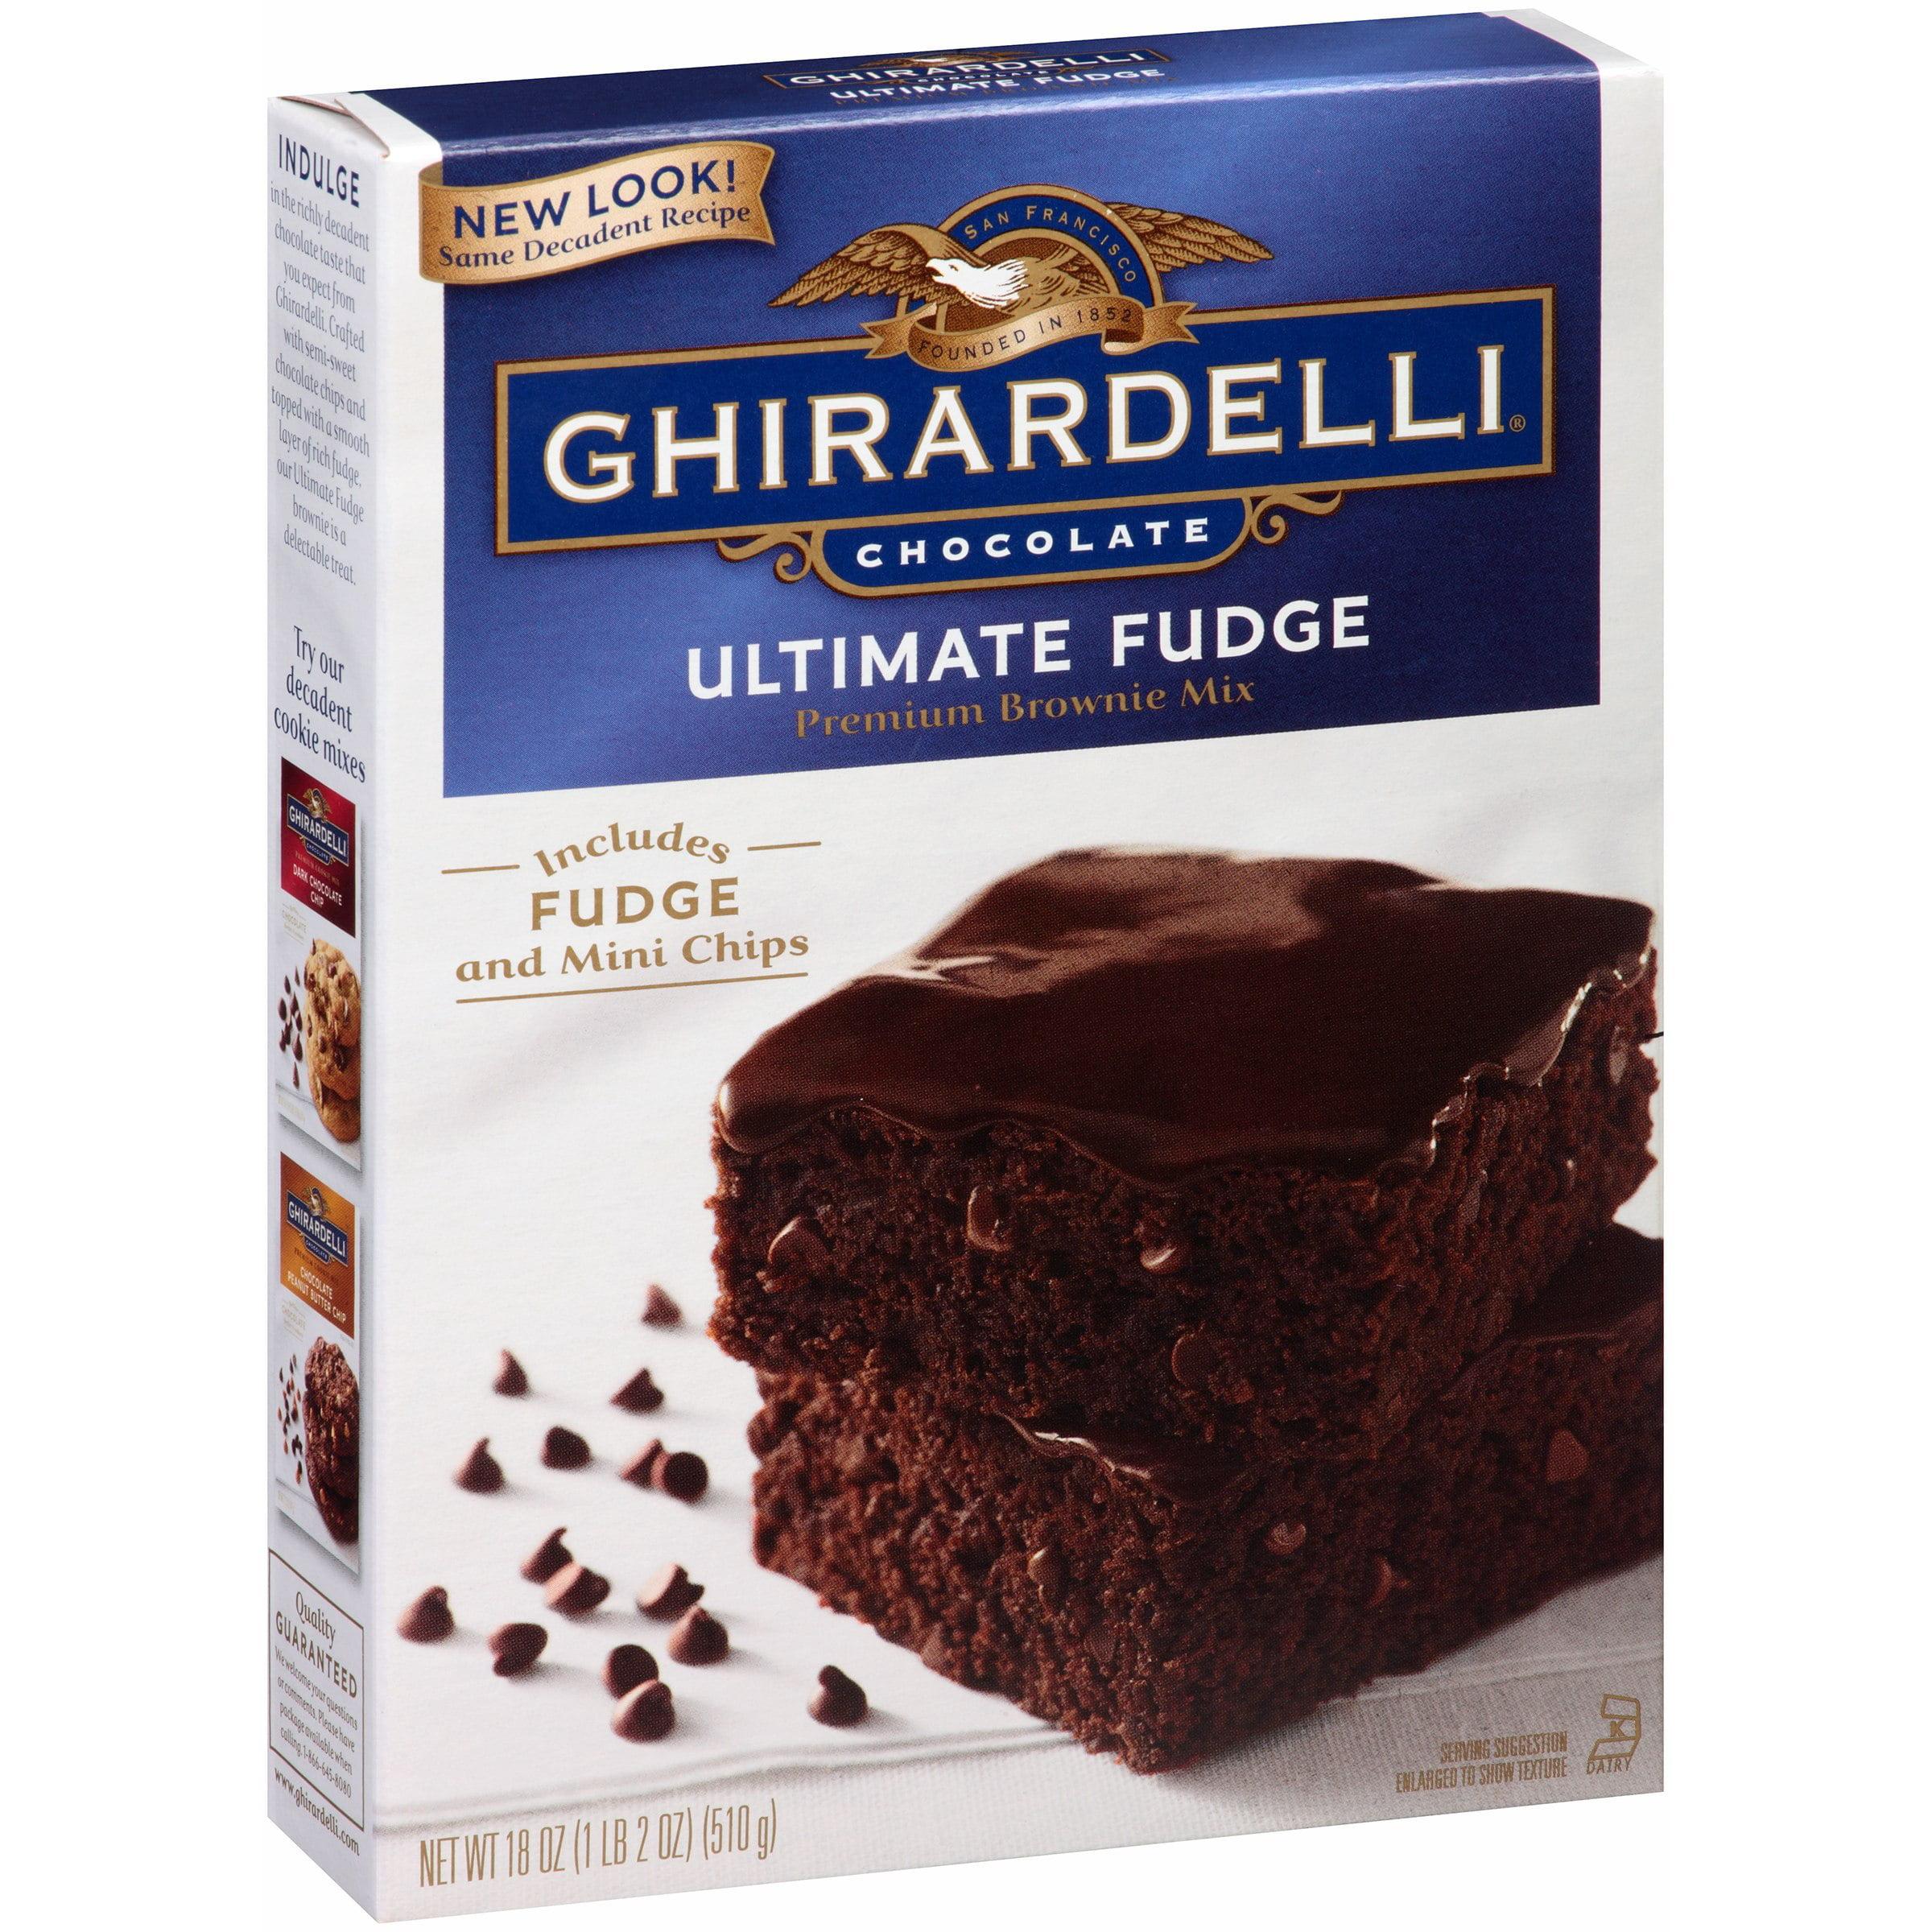 Ghirardelli Chocolate Brownie Mix, Ultimate Fudge, 18 Oz